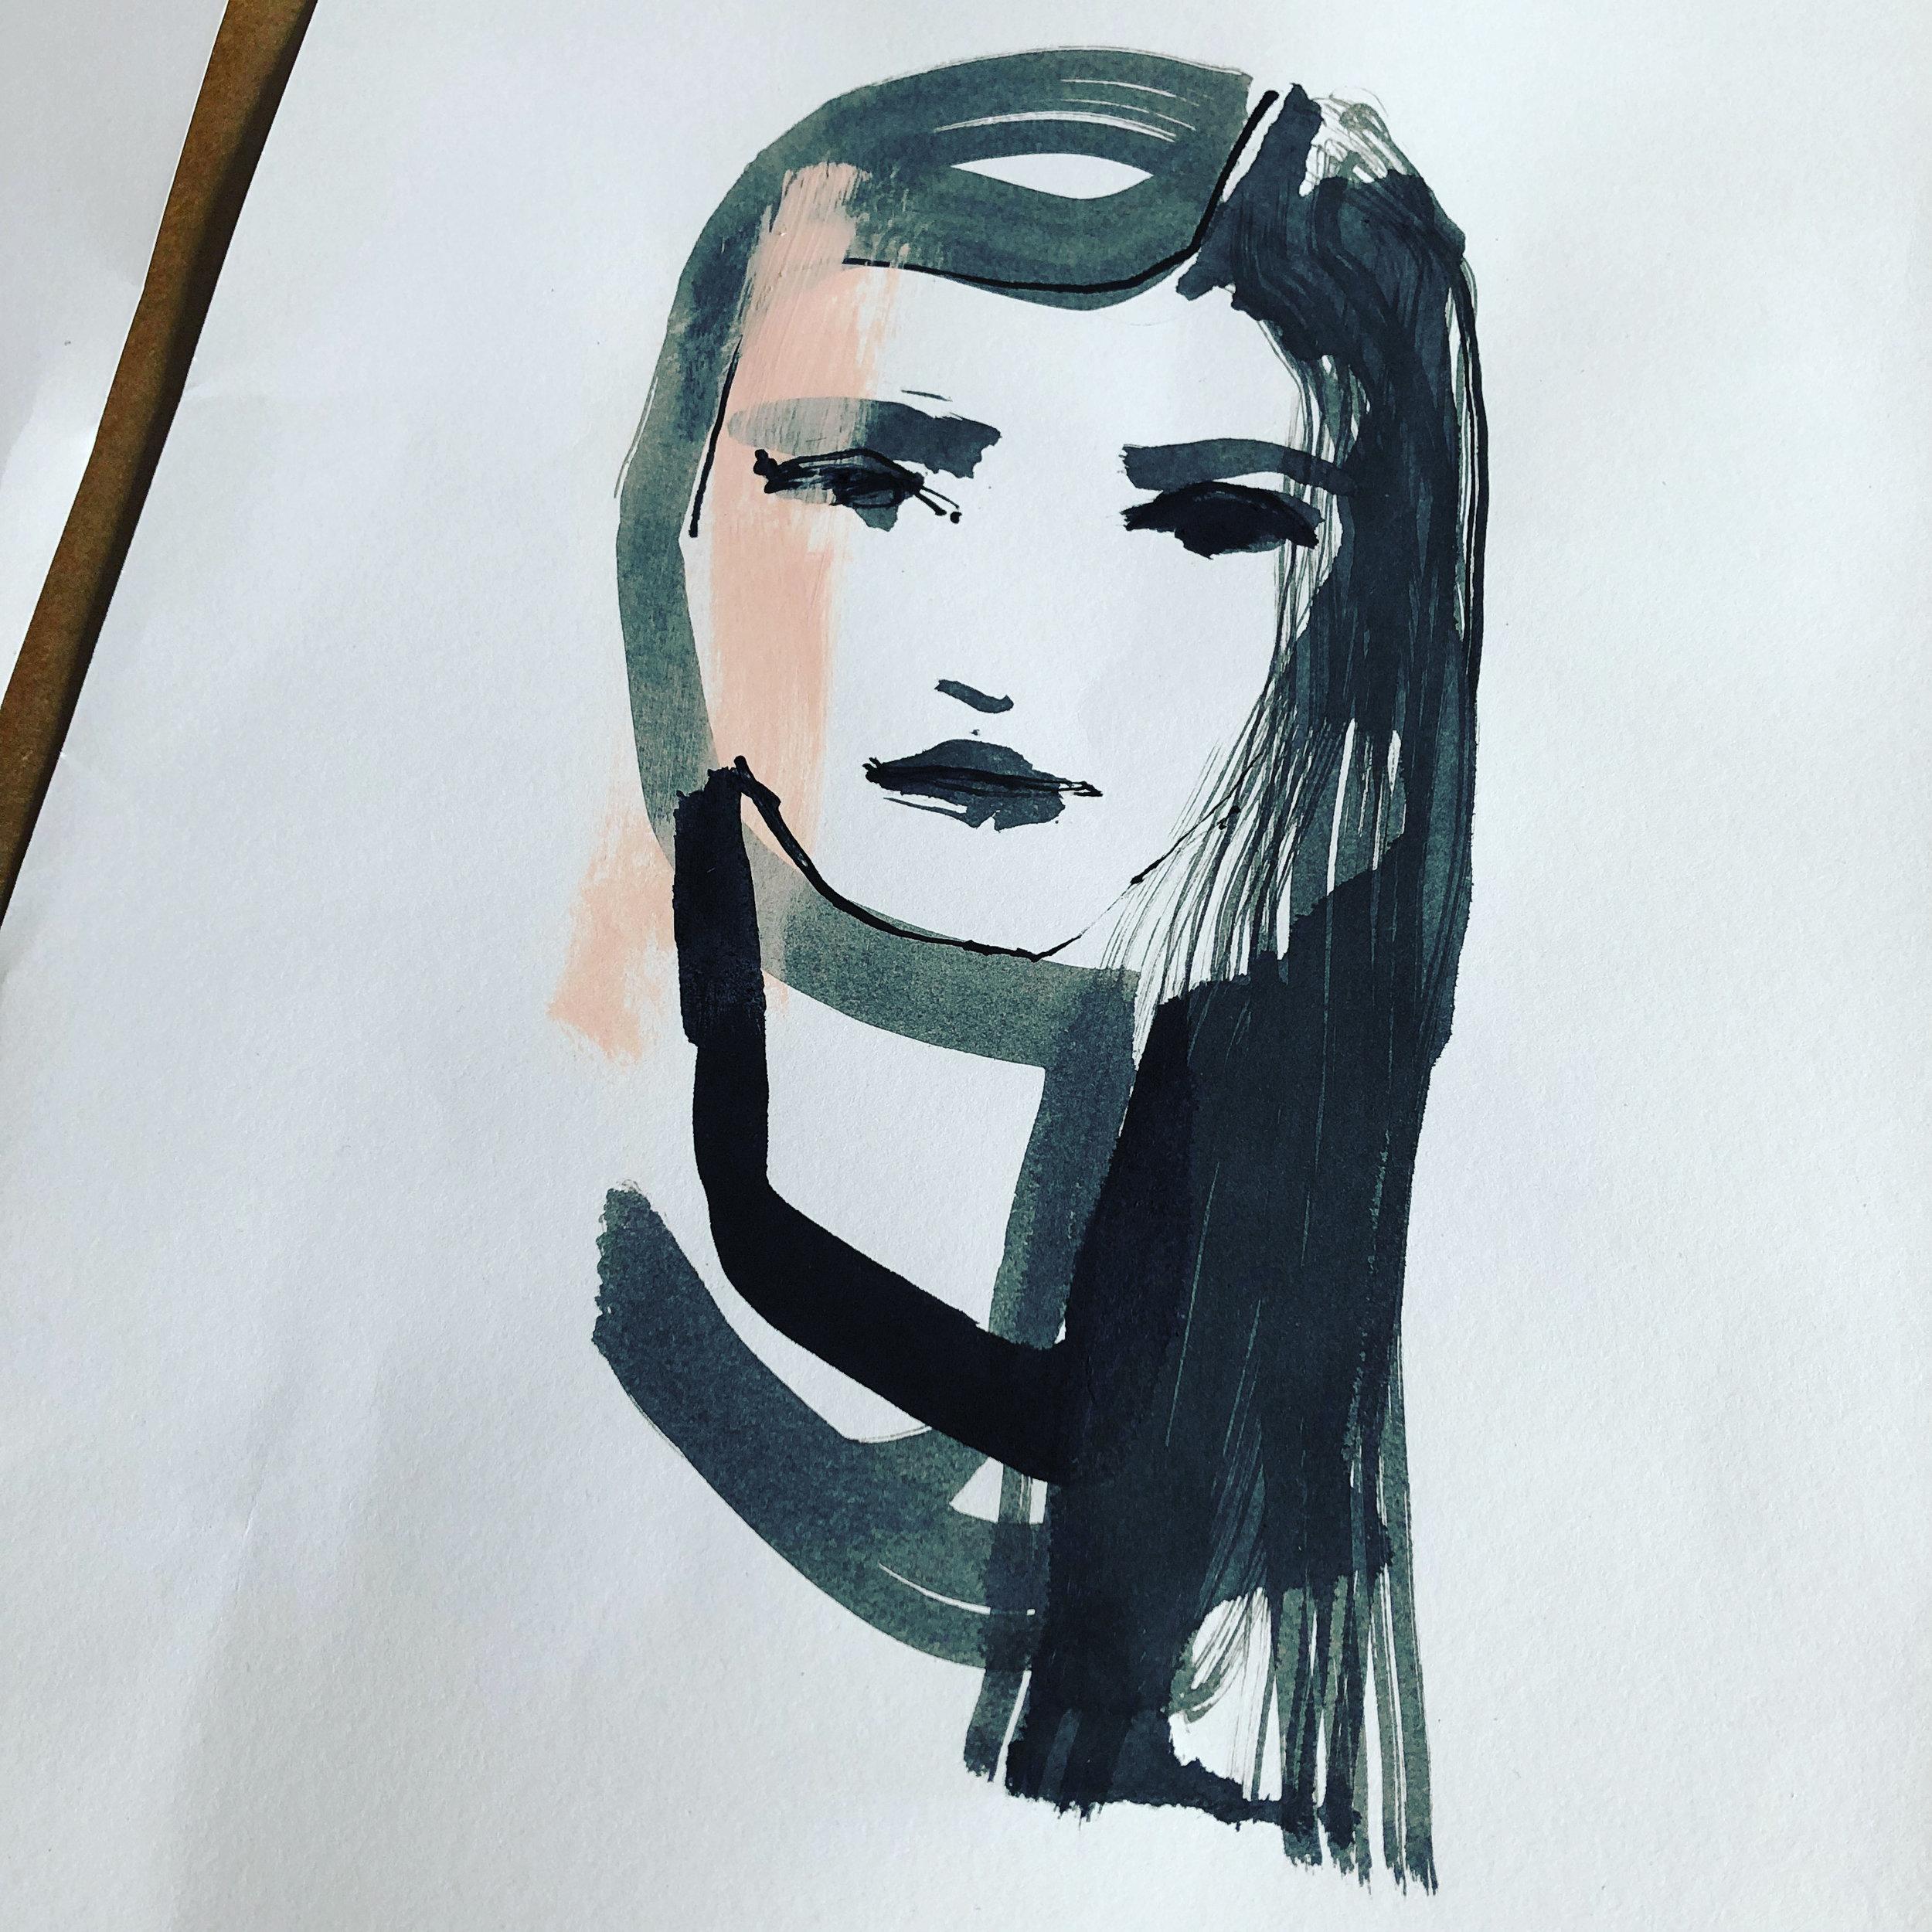 TessaIllustration_imperfectionisbeauty.jpg